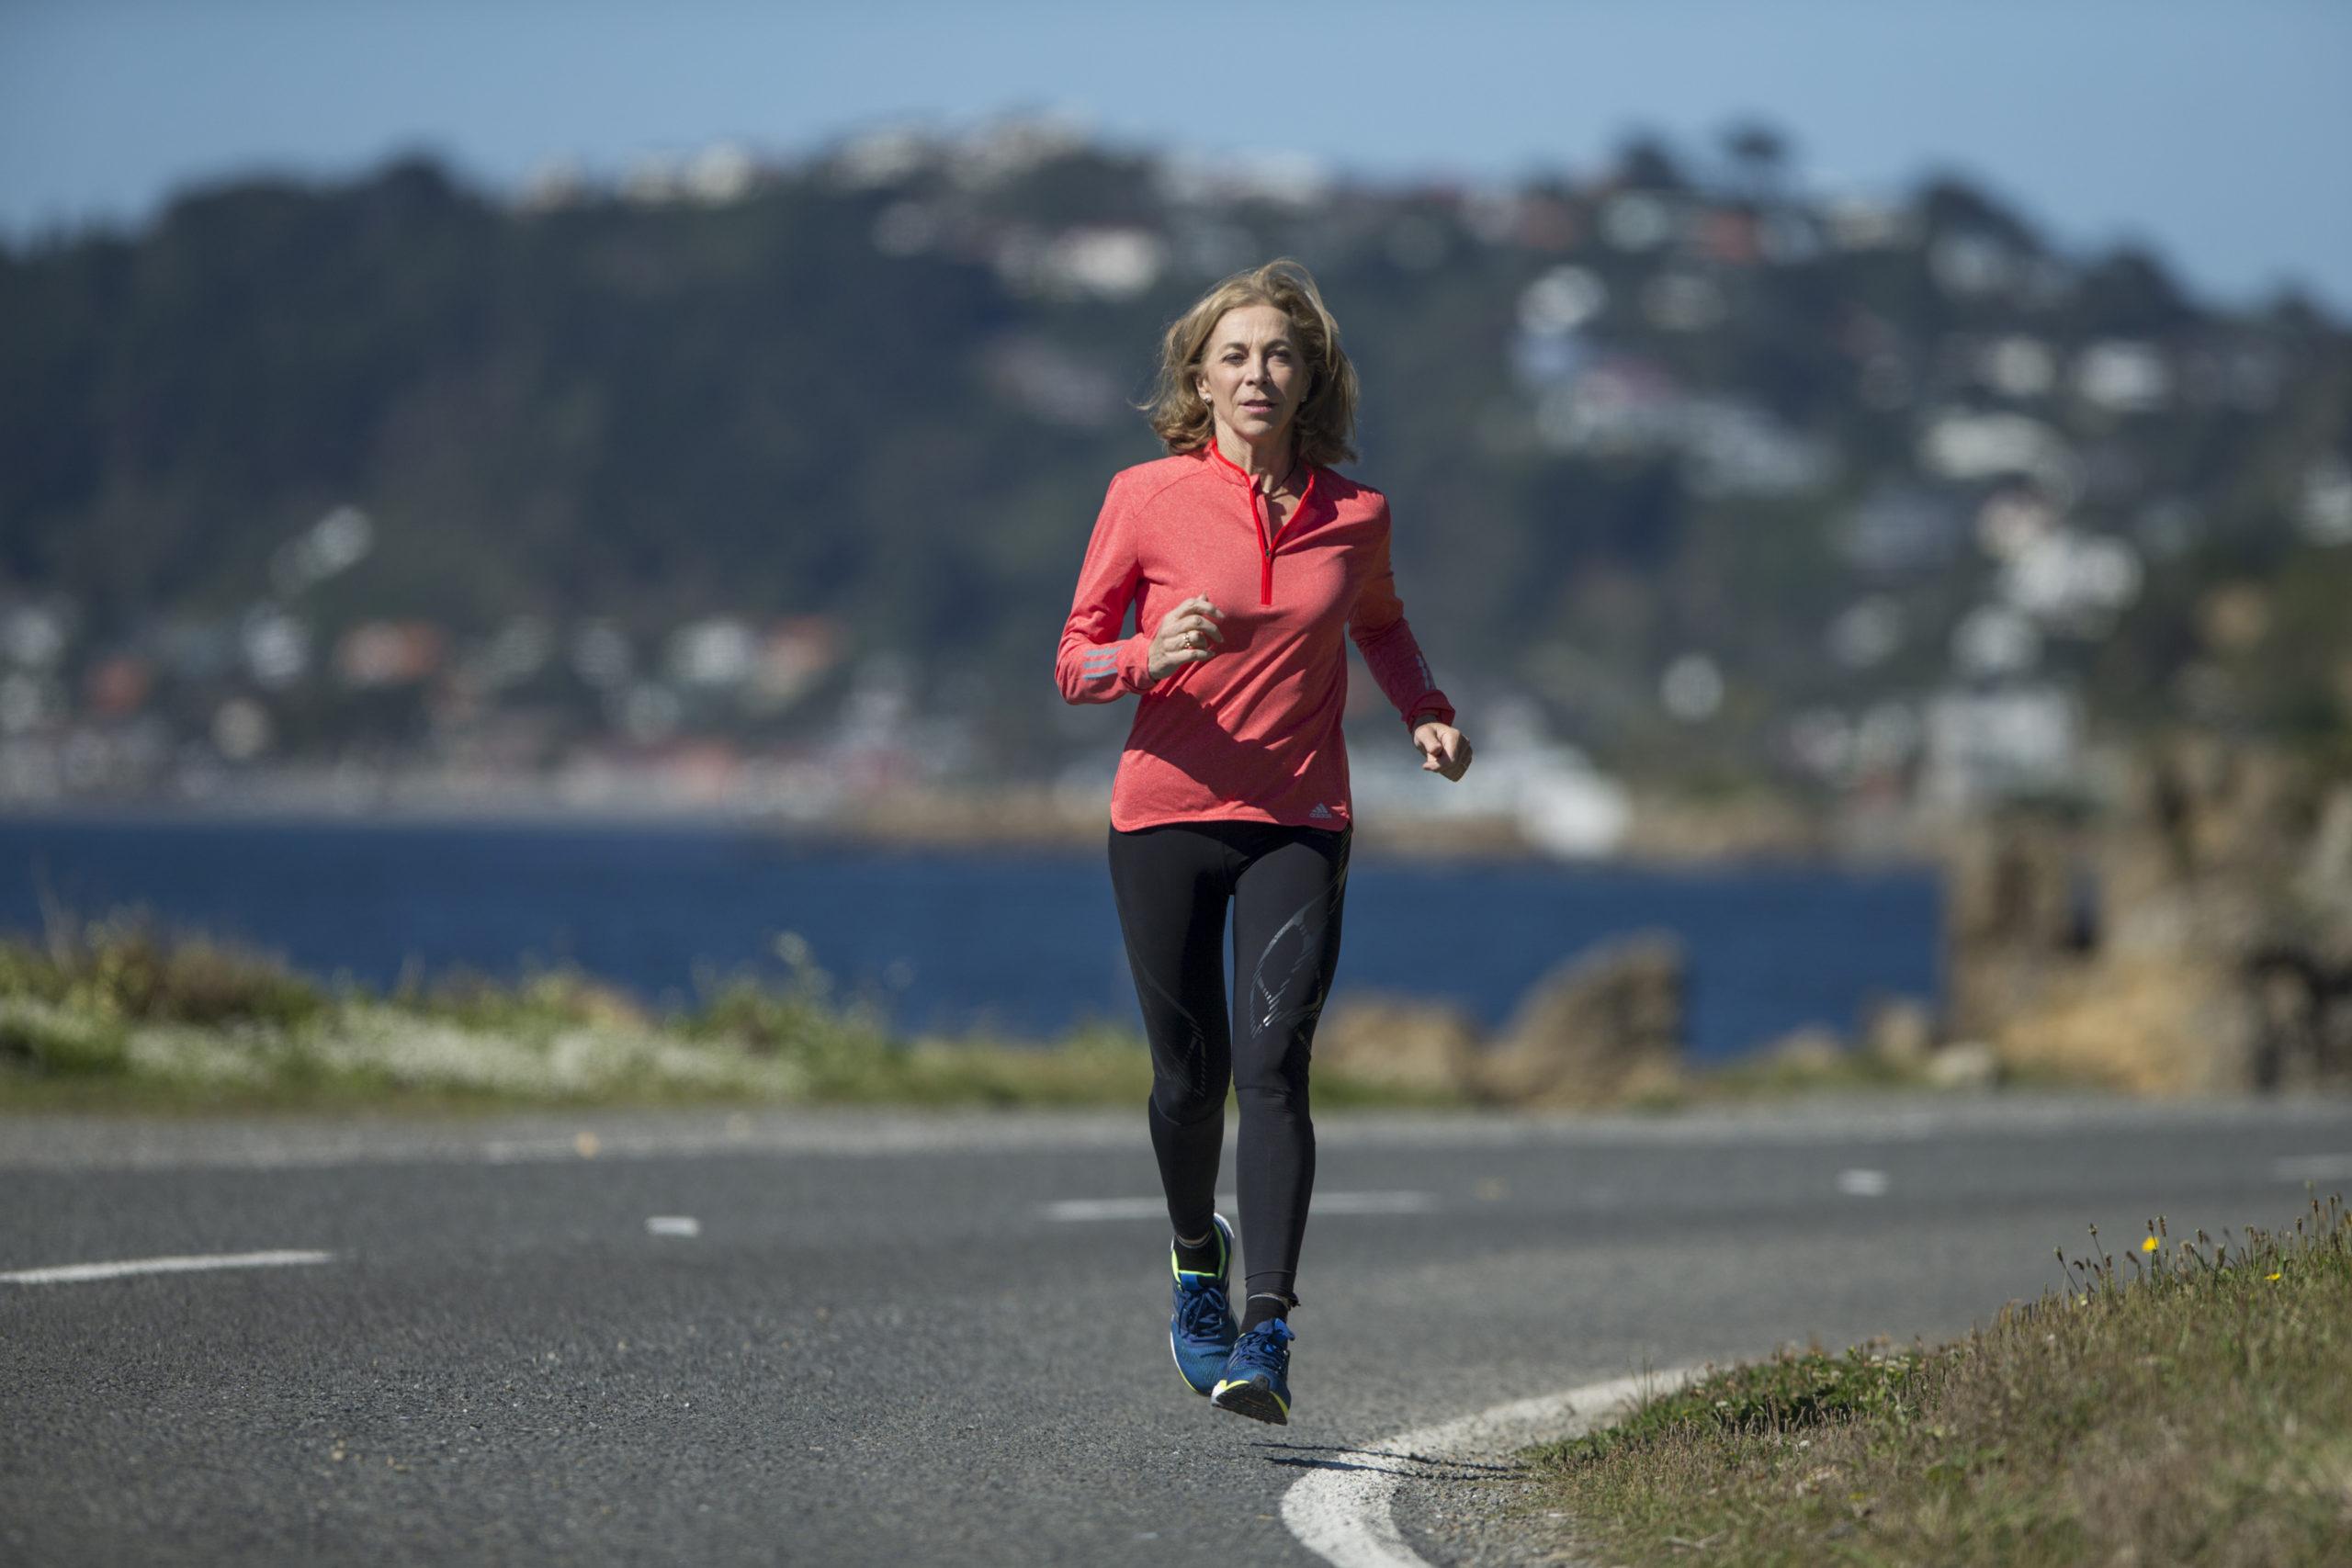 Blog 53: Celebrating marathon runners